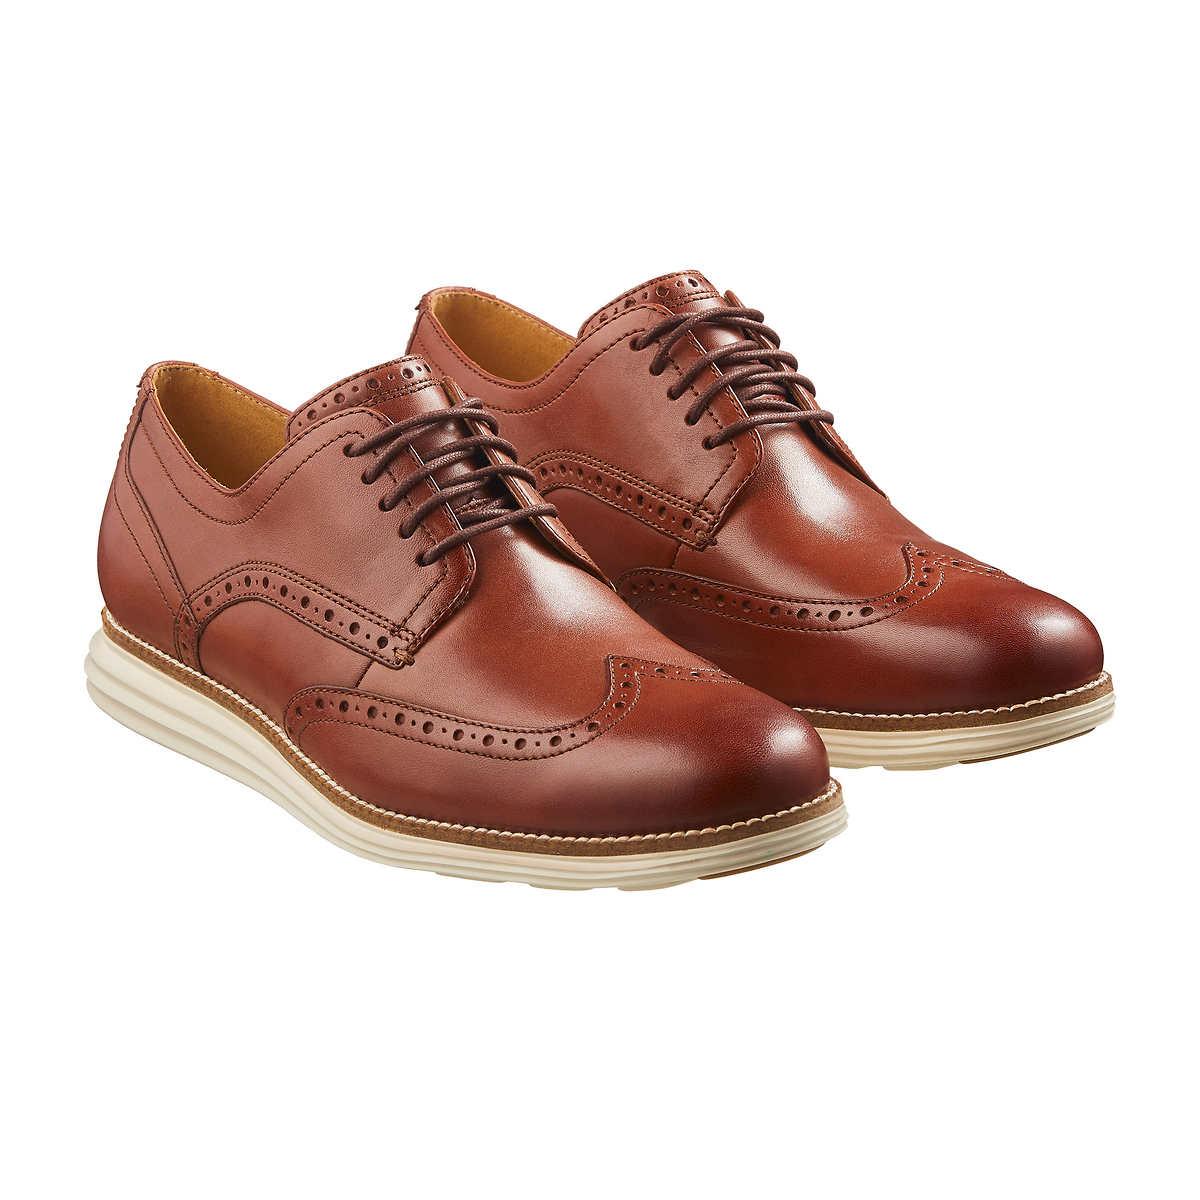 Cole Haan Men's Original Grand Shortwing Oxford Shoe, Woodbury Leather/Ivory, 10 Medium US